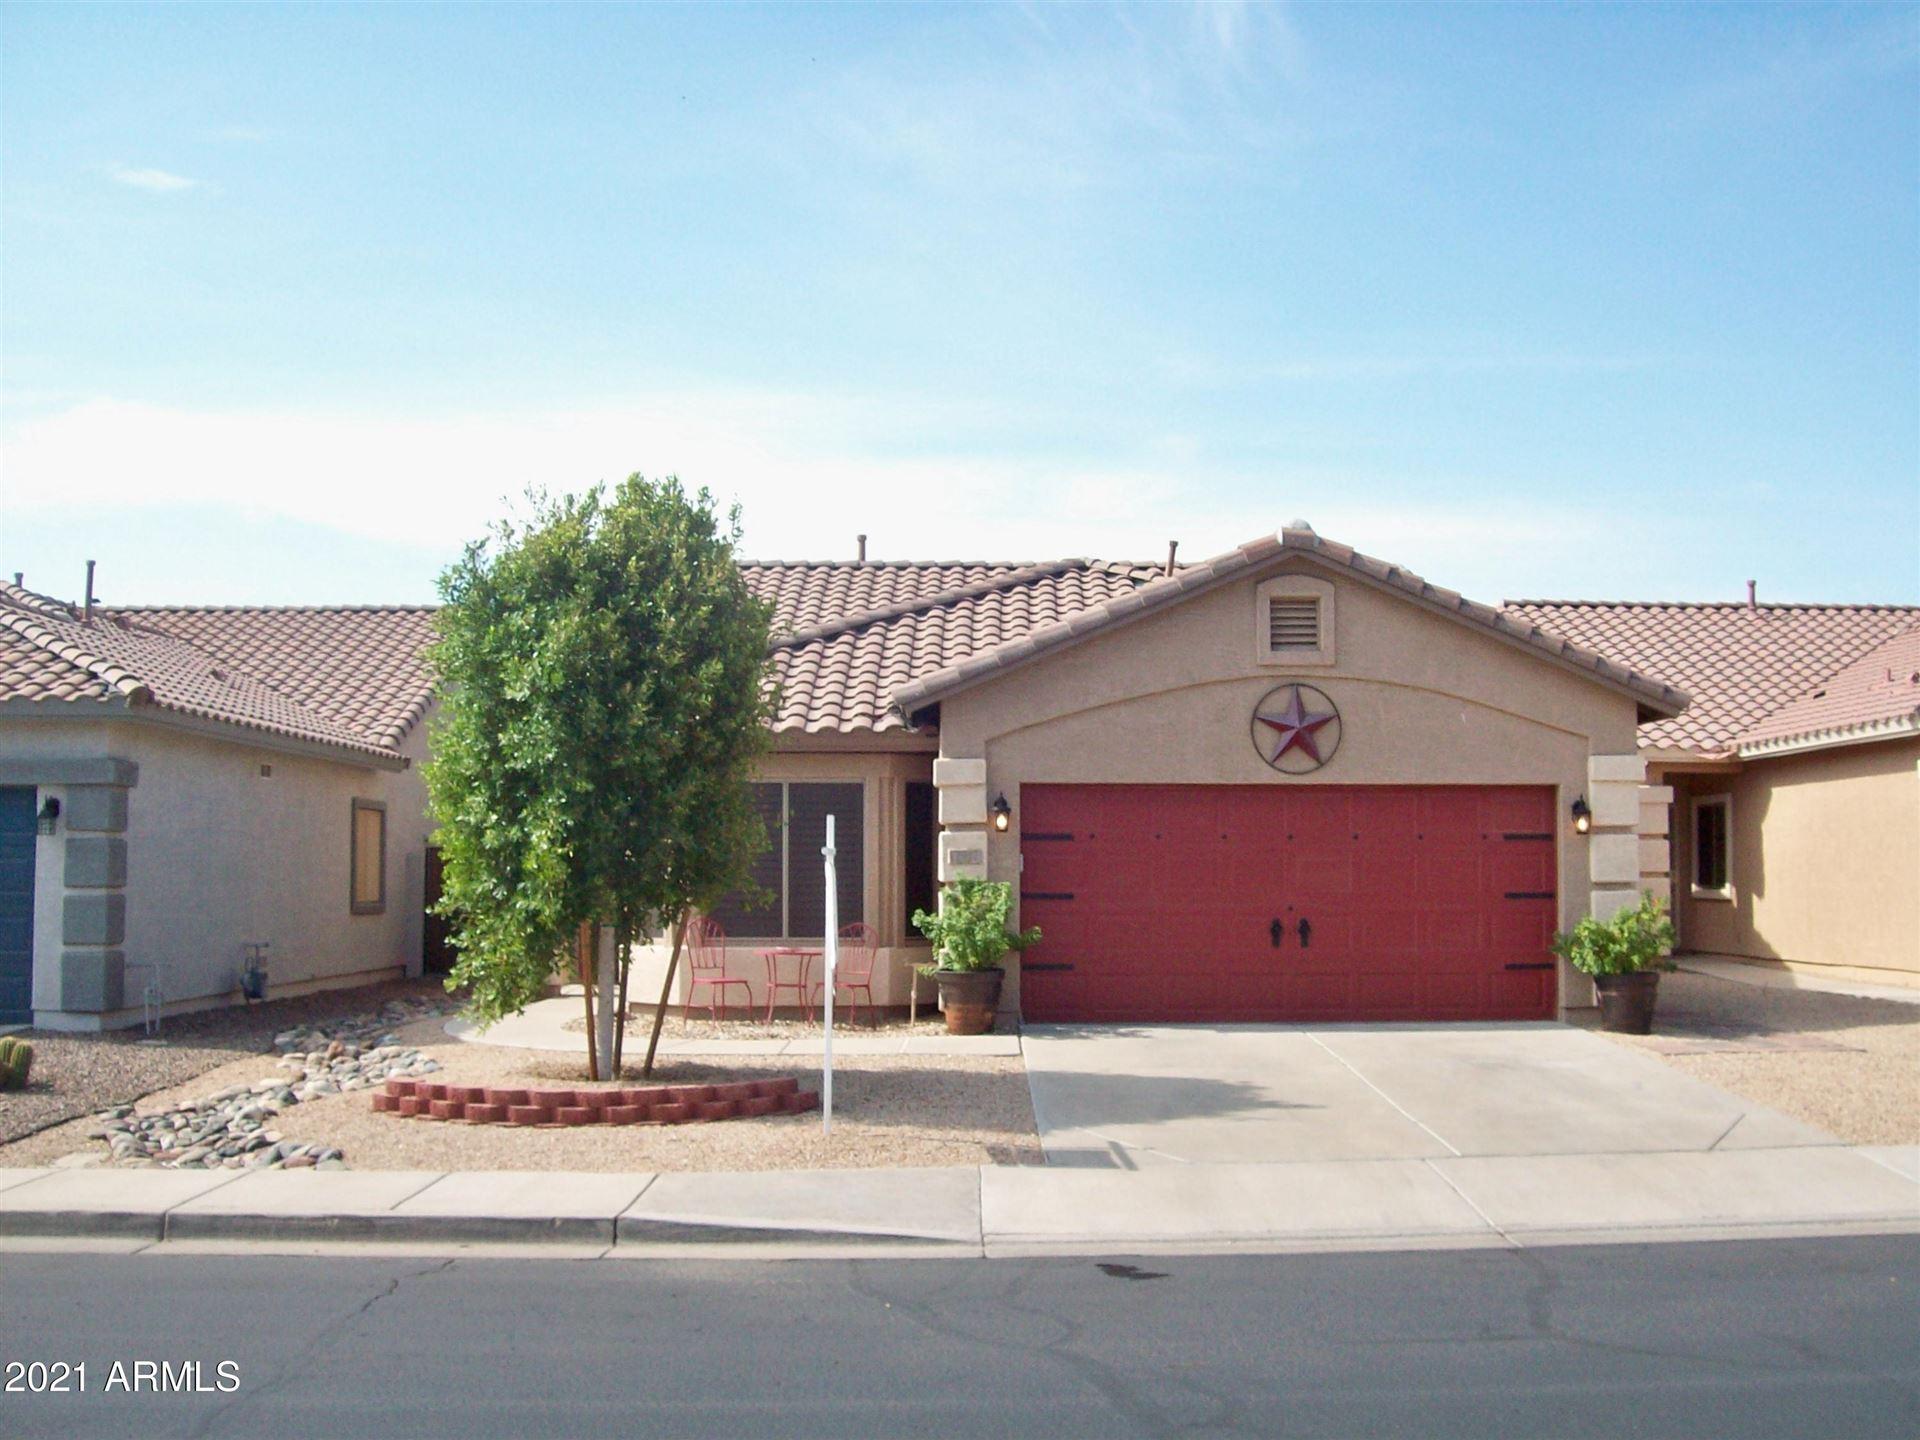 Photo of 12917 W COLUMBINE Drive, El Mirage, AZ 85335 (MLS # 6267167)